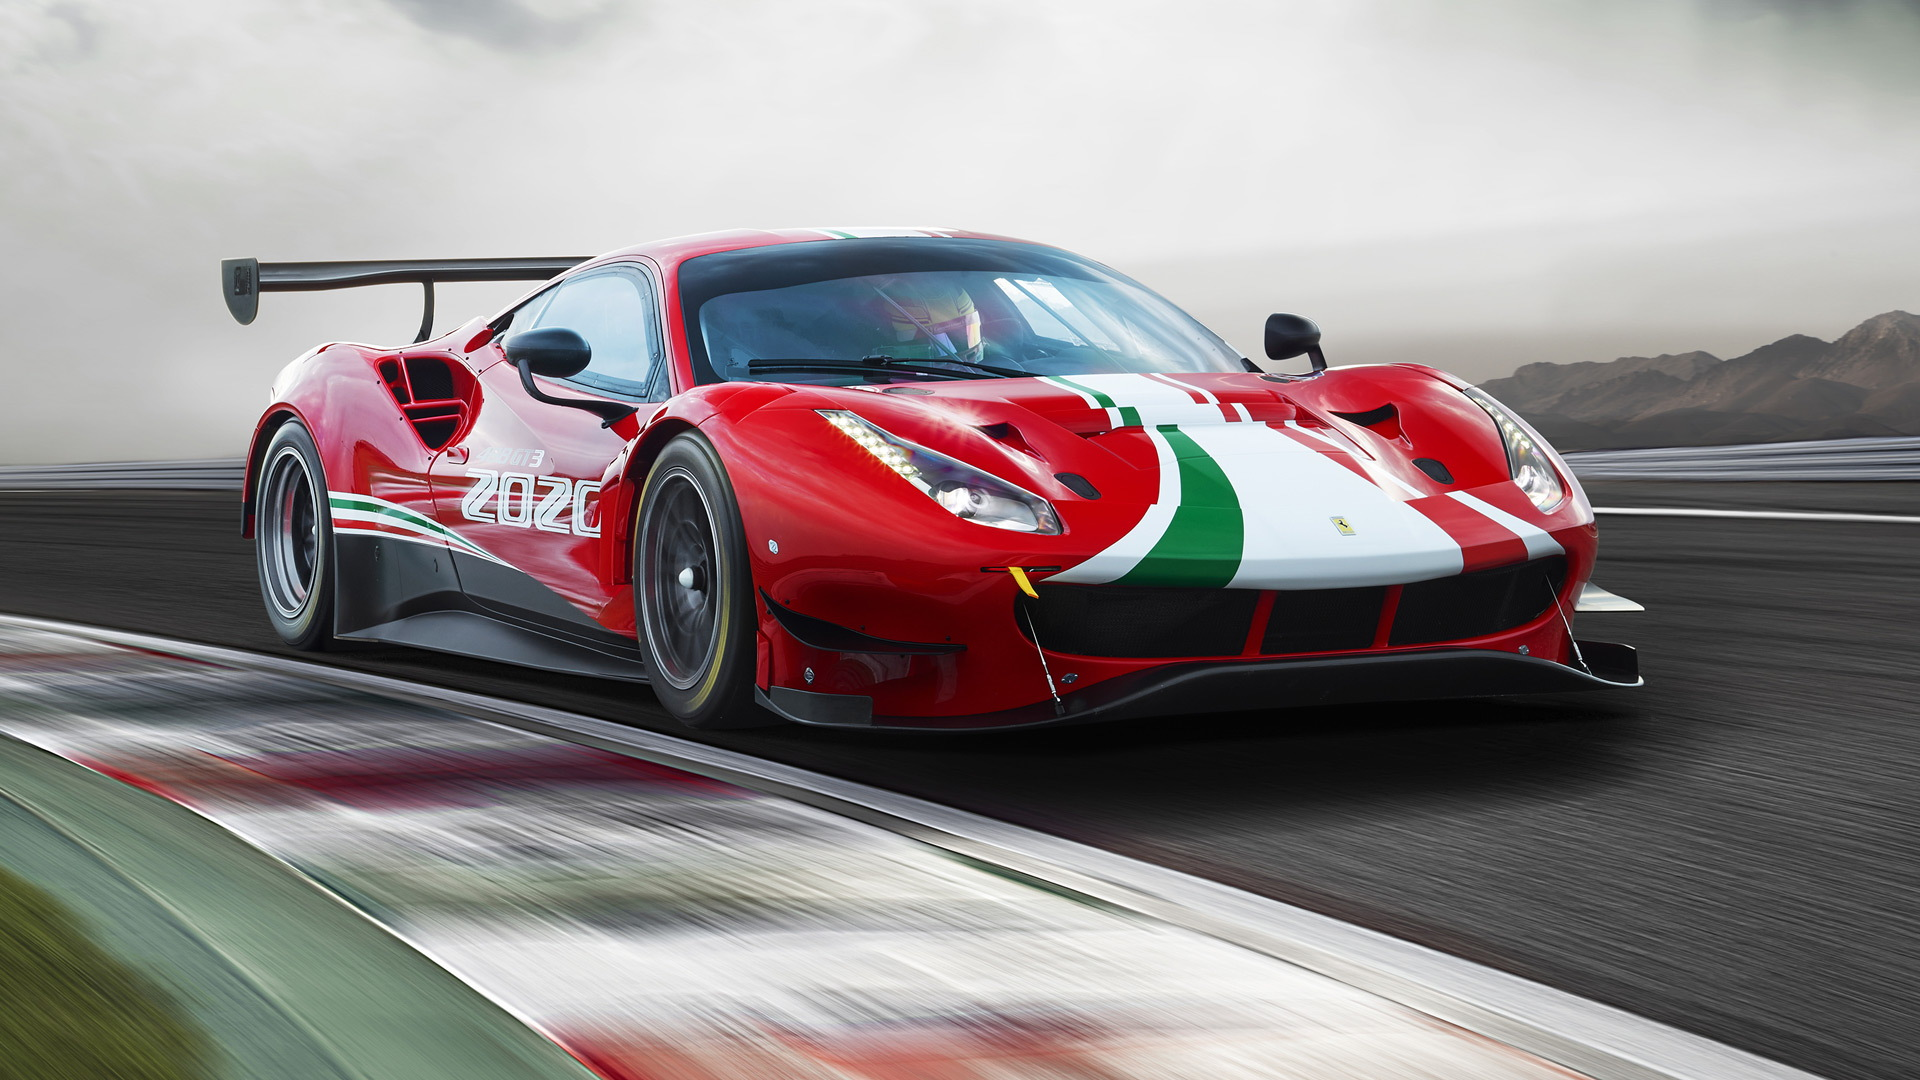 2020 Ferrari 488 GT3 Evo race car